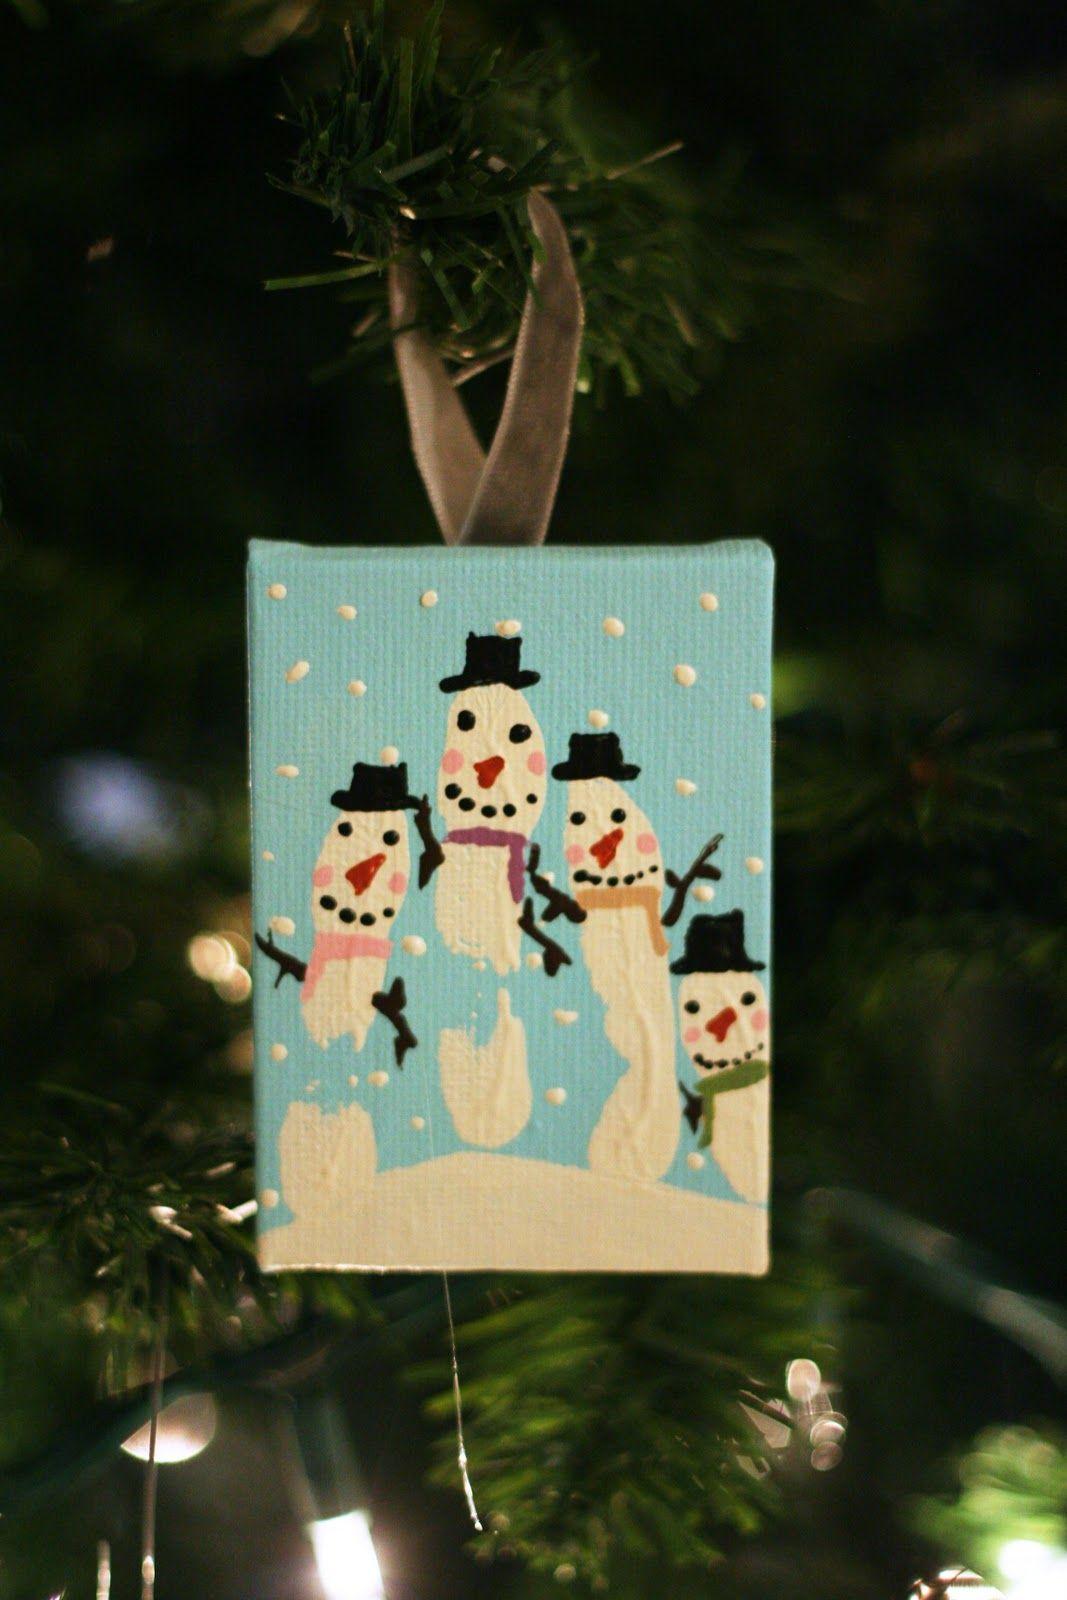 Hand Print Snowman Ornaments Snowman Handprint Ornament Hand Print Snowman Handprint Ornaments